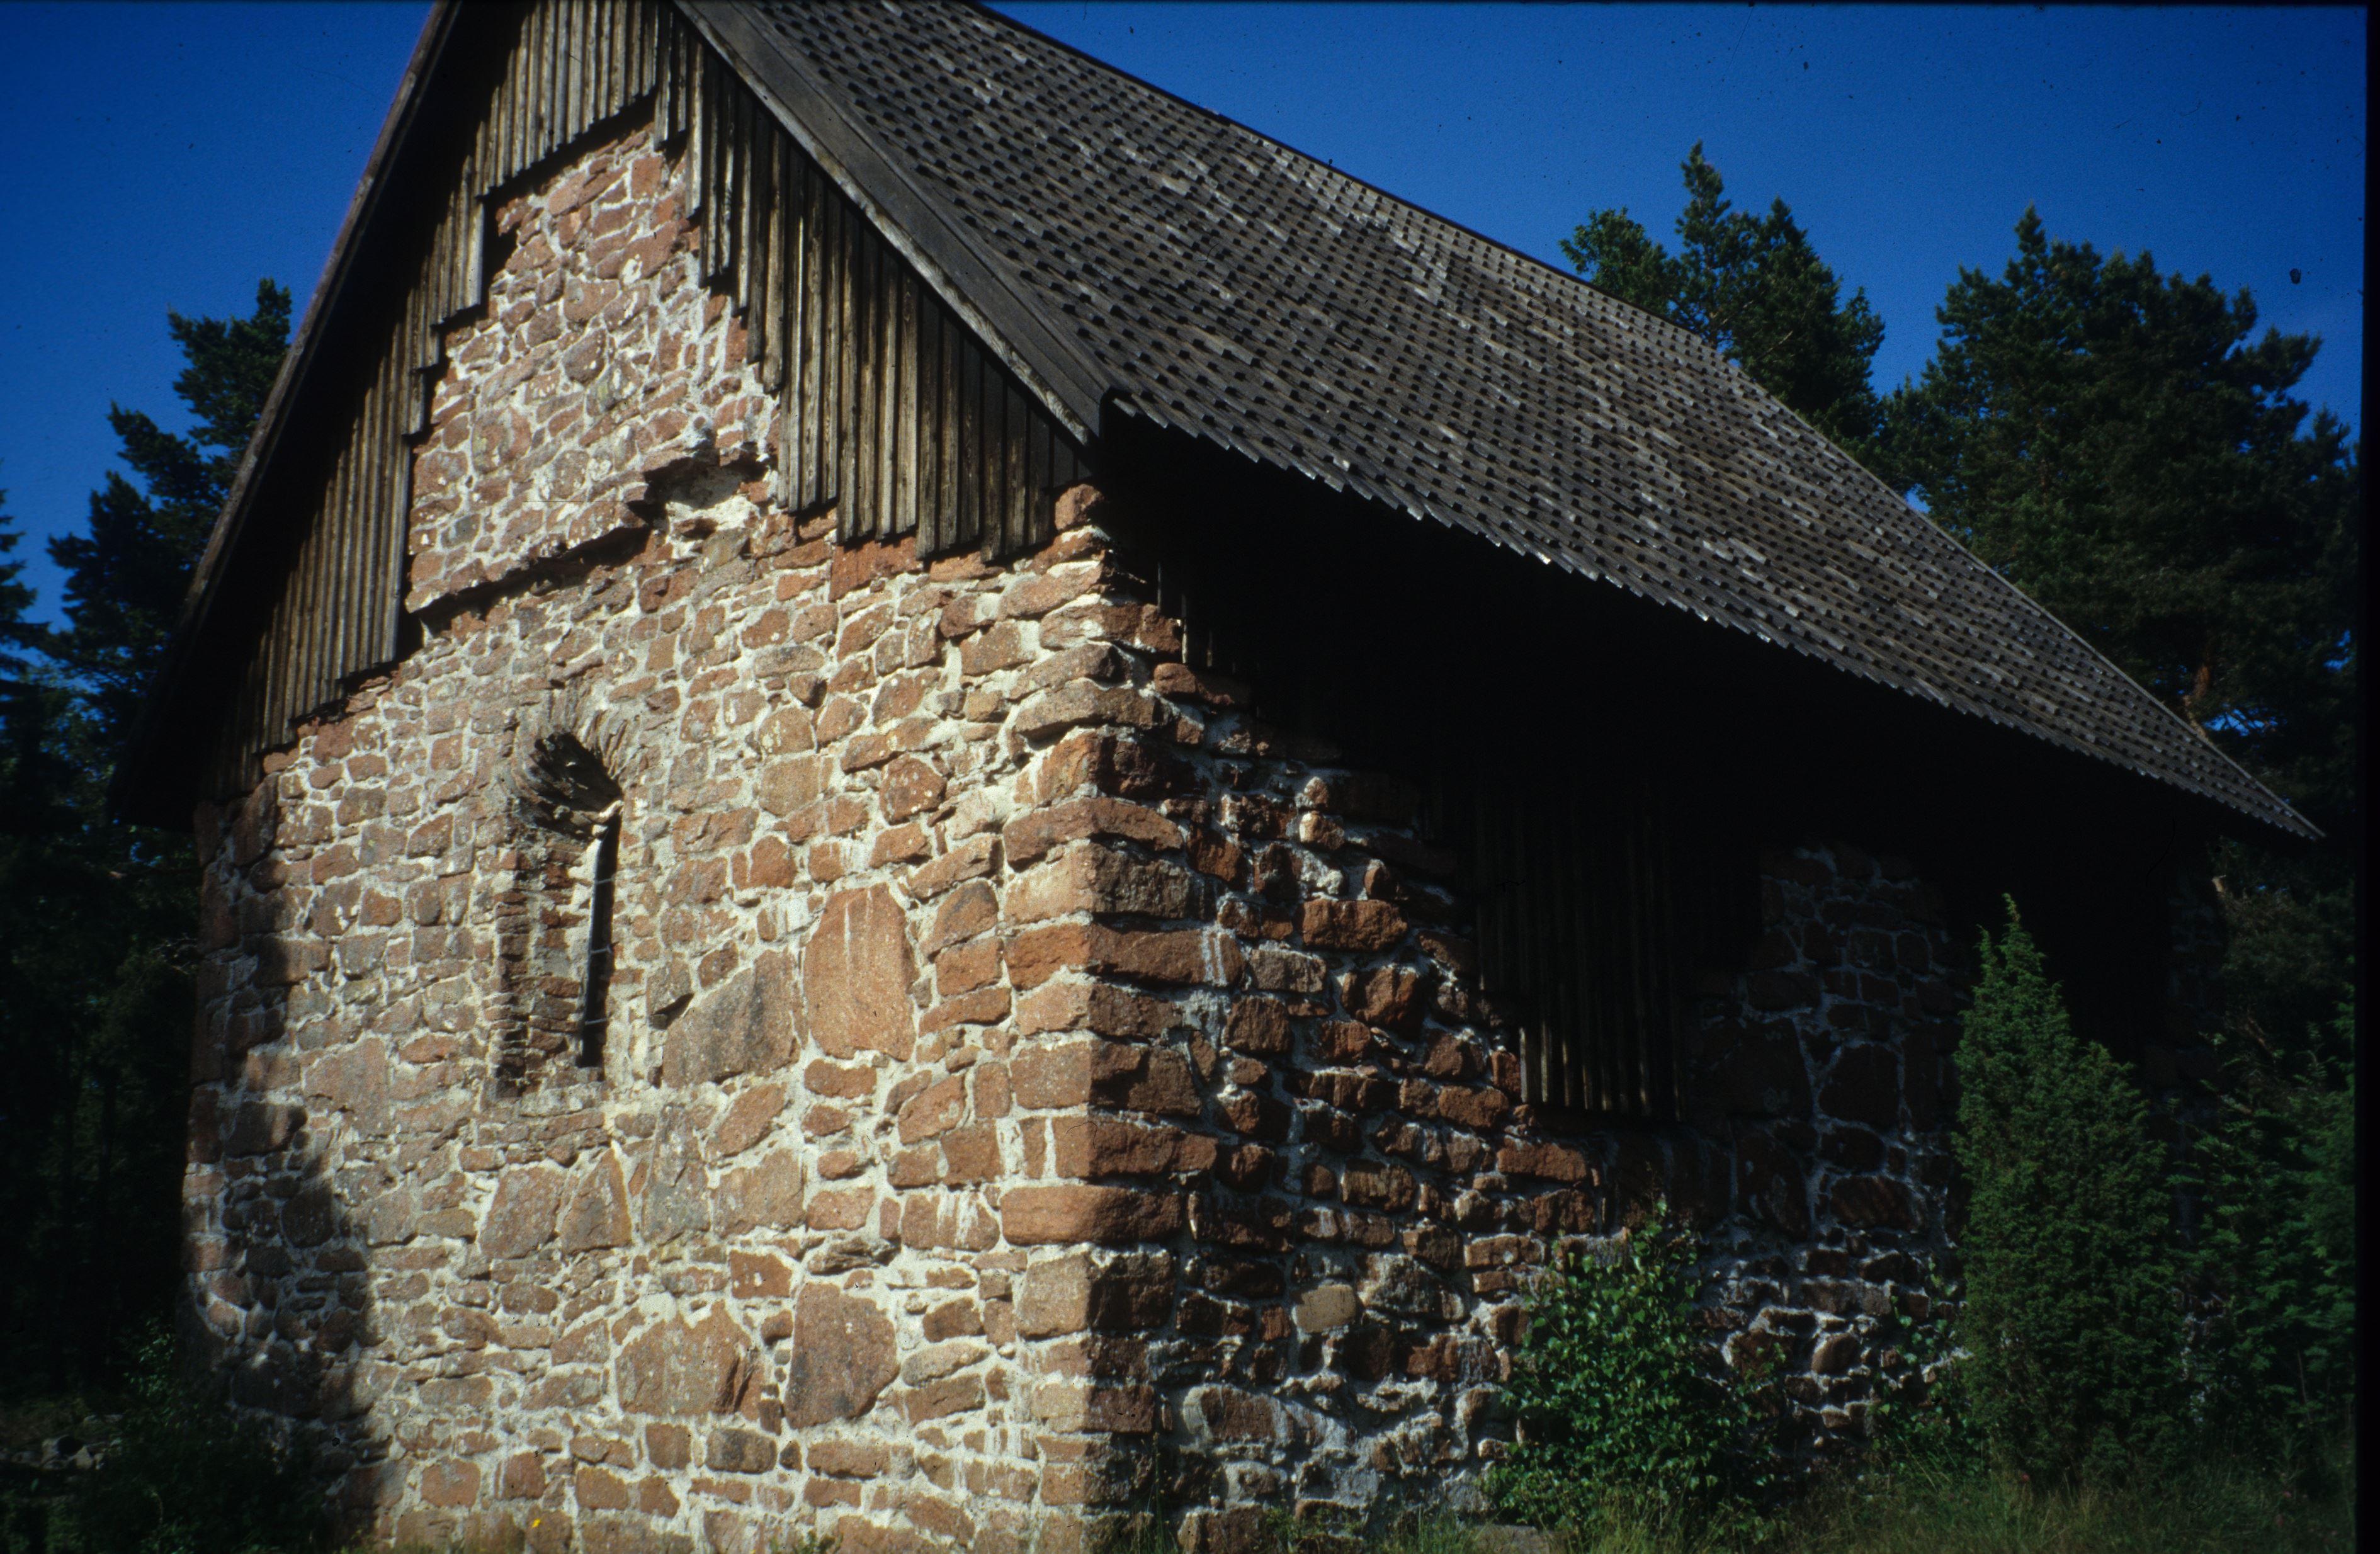 © kyrkor.ax, Lemböten kappelirauniot